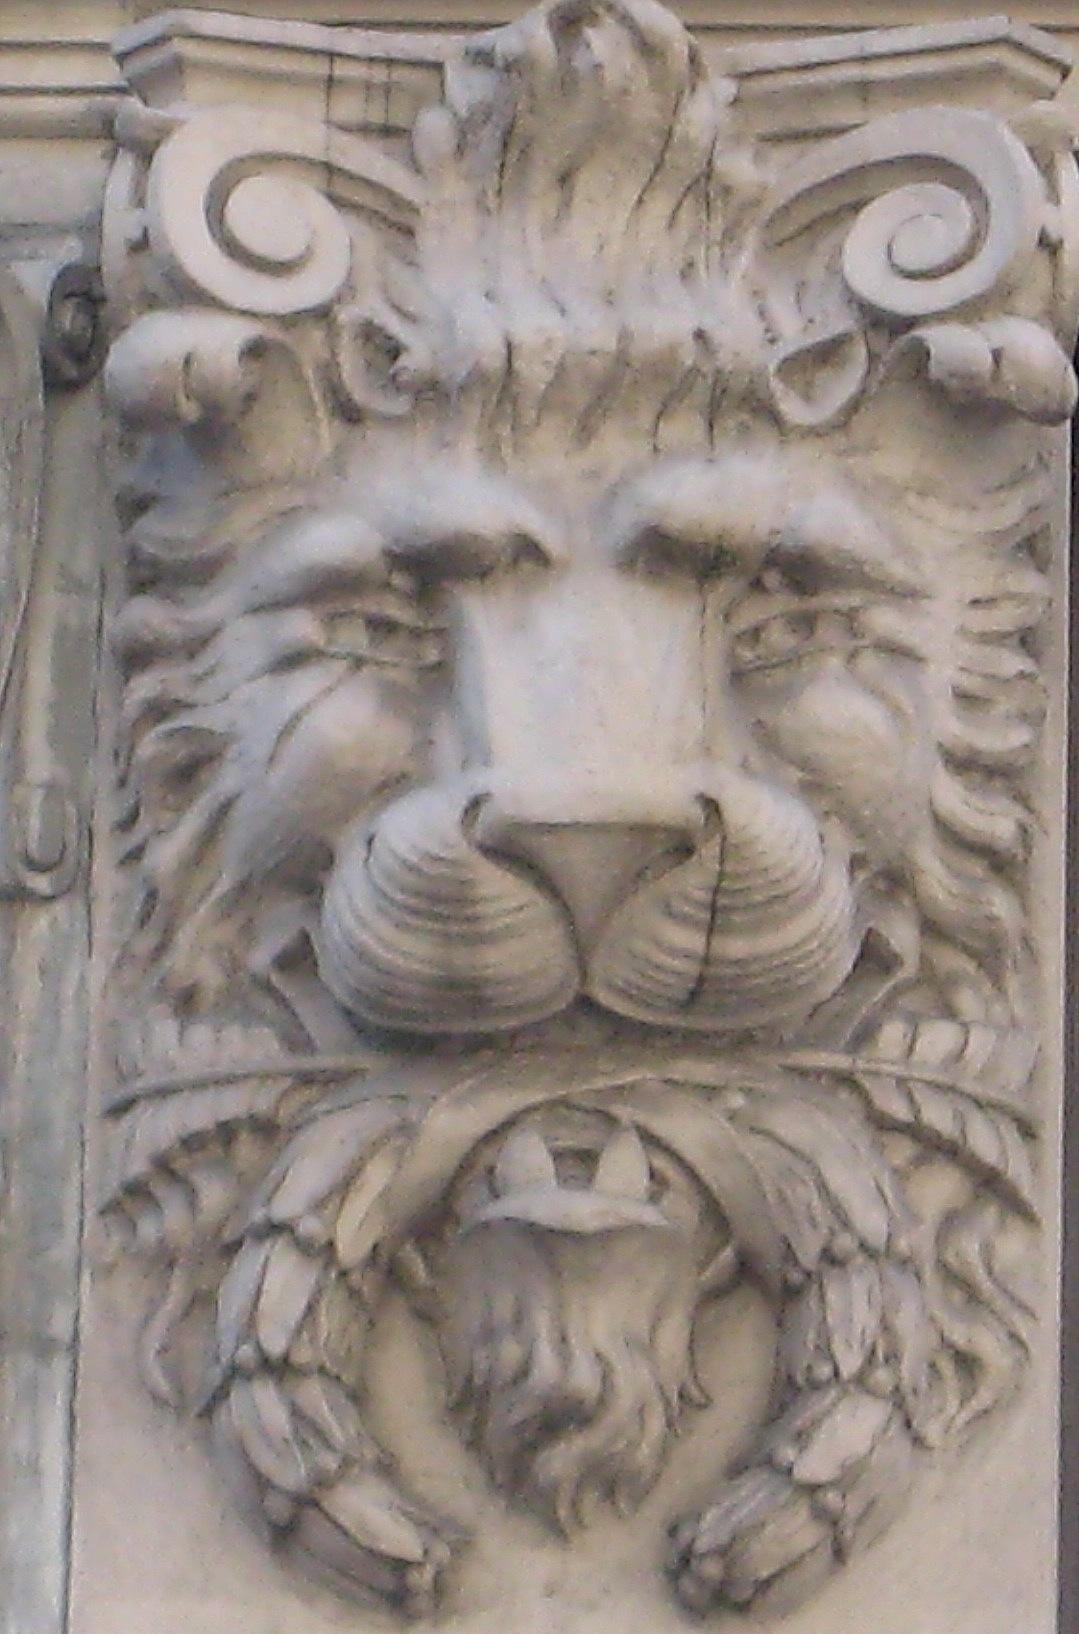 The lions adorning city buildings | Ephemeral New York